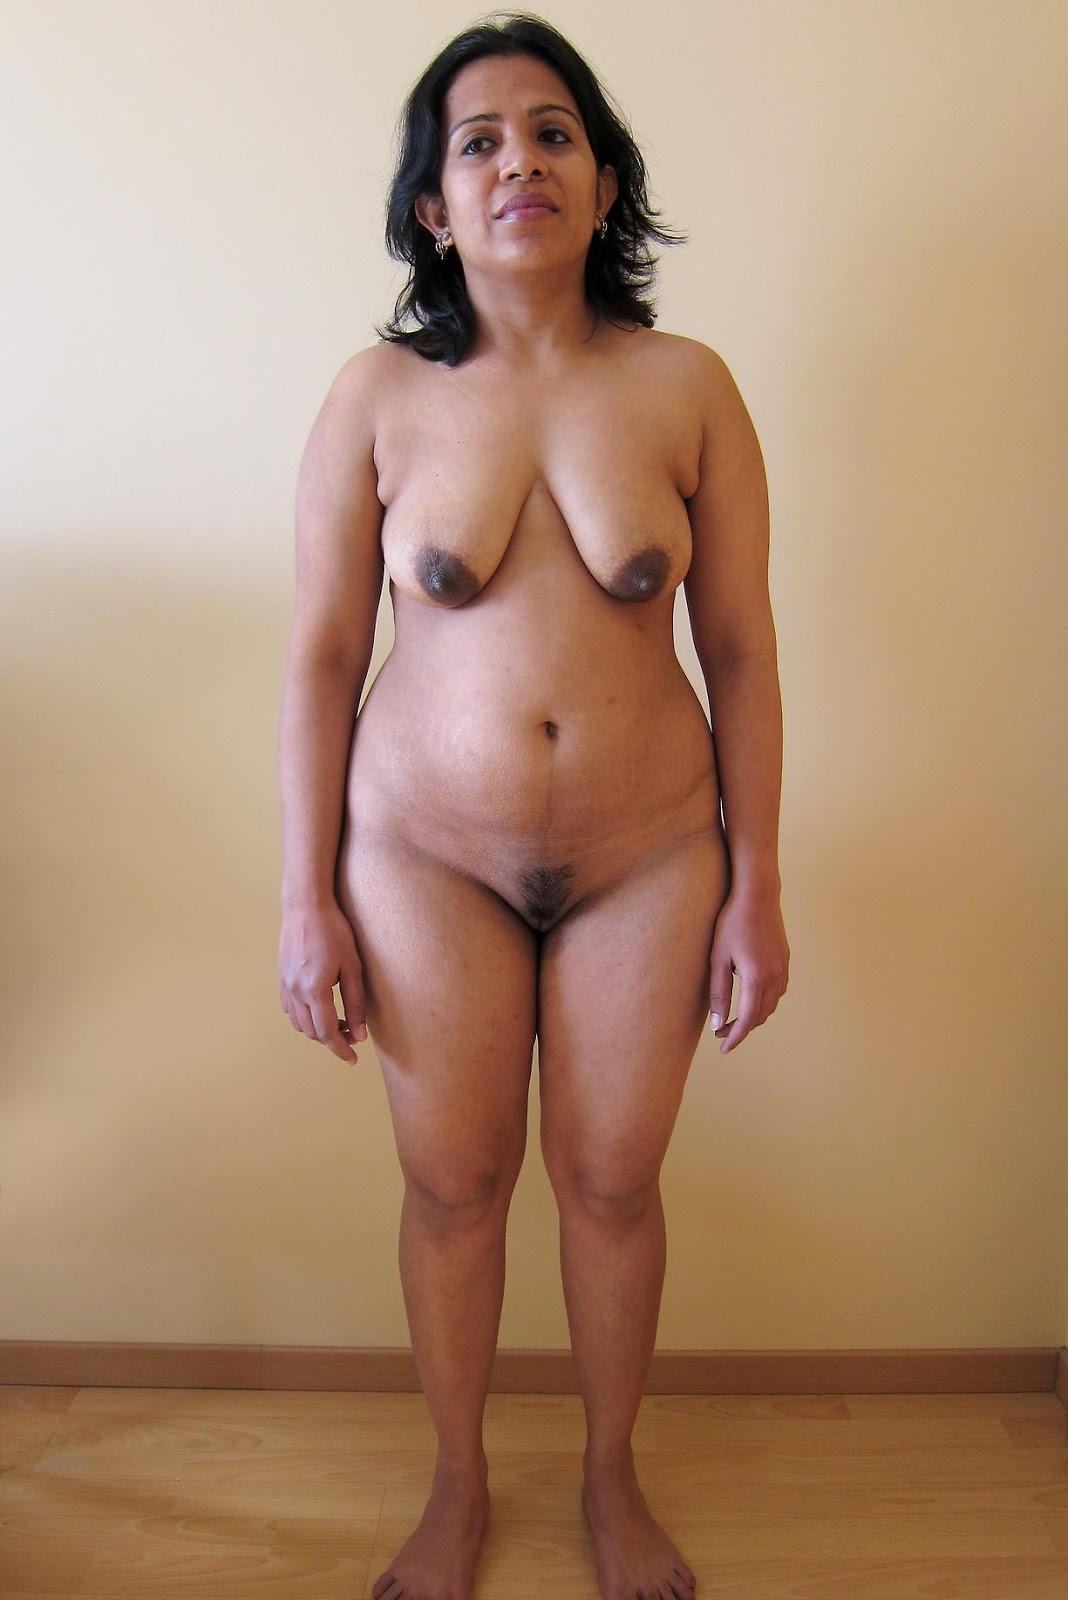 Desi Aunty Nude Image Images Nude Photos Sex Gallery 11